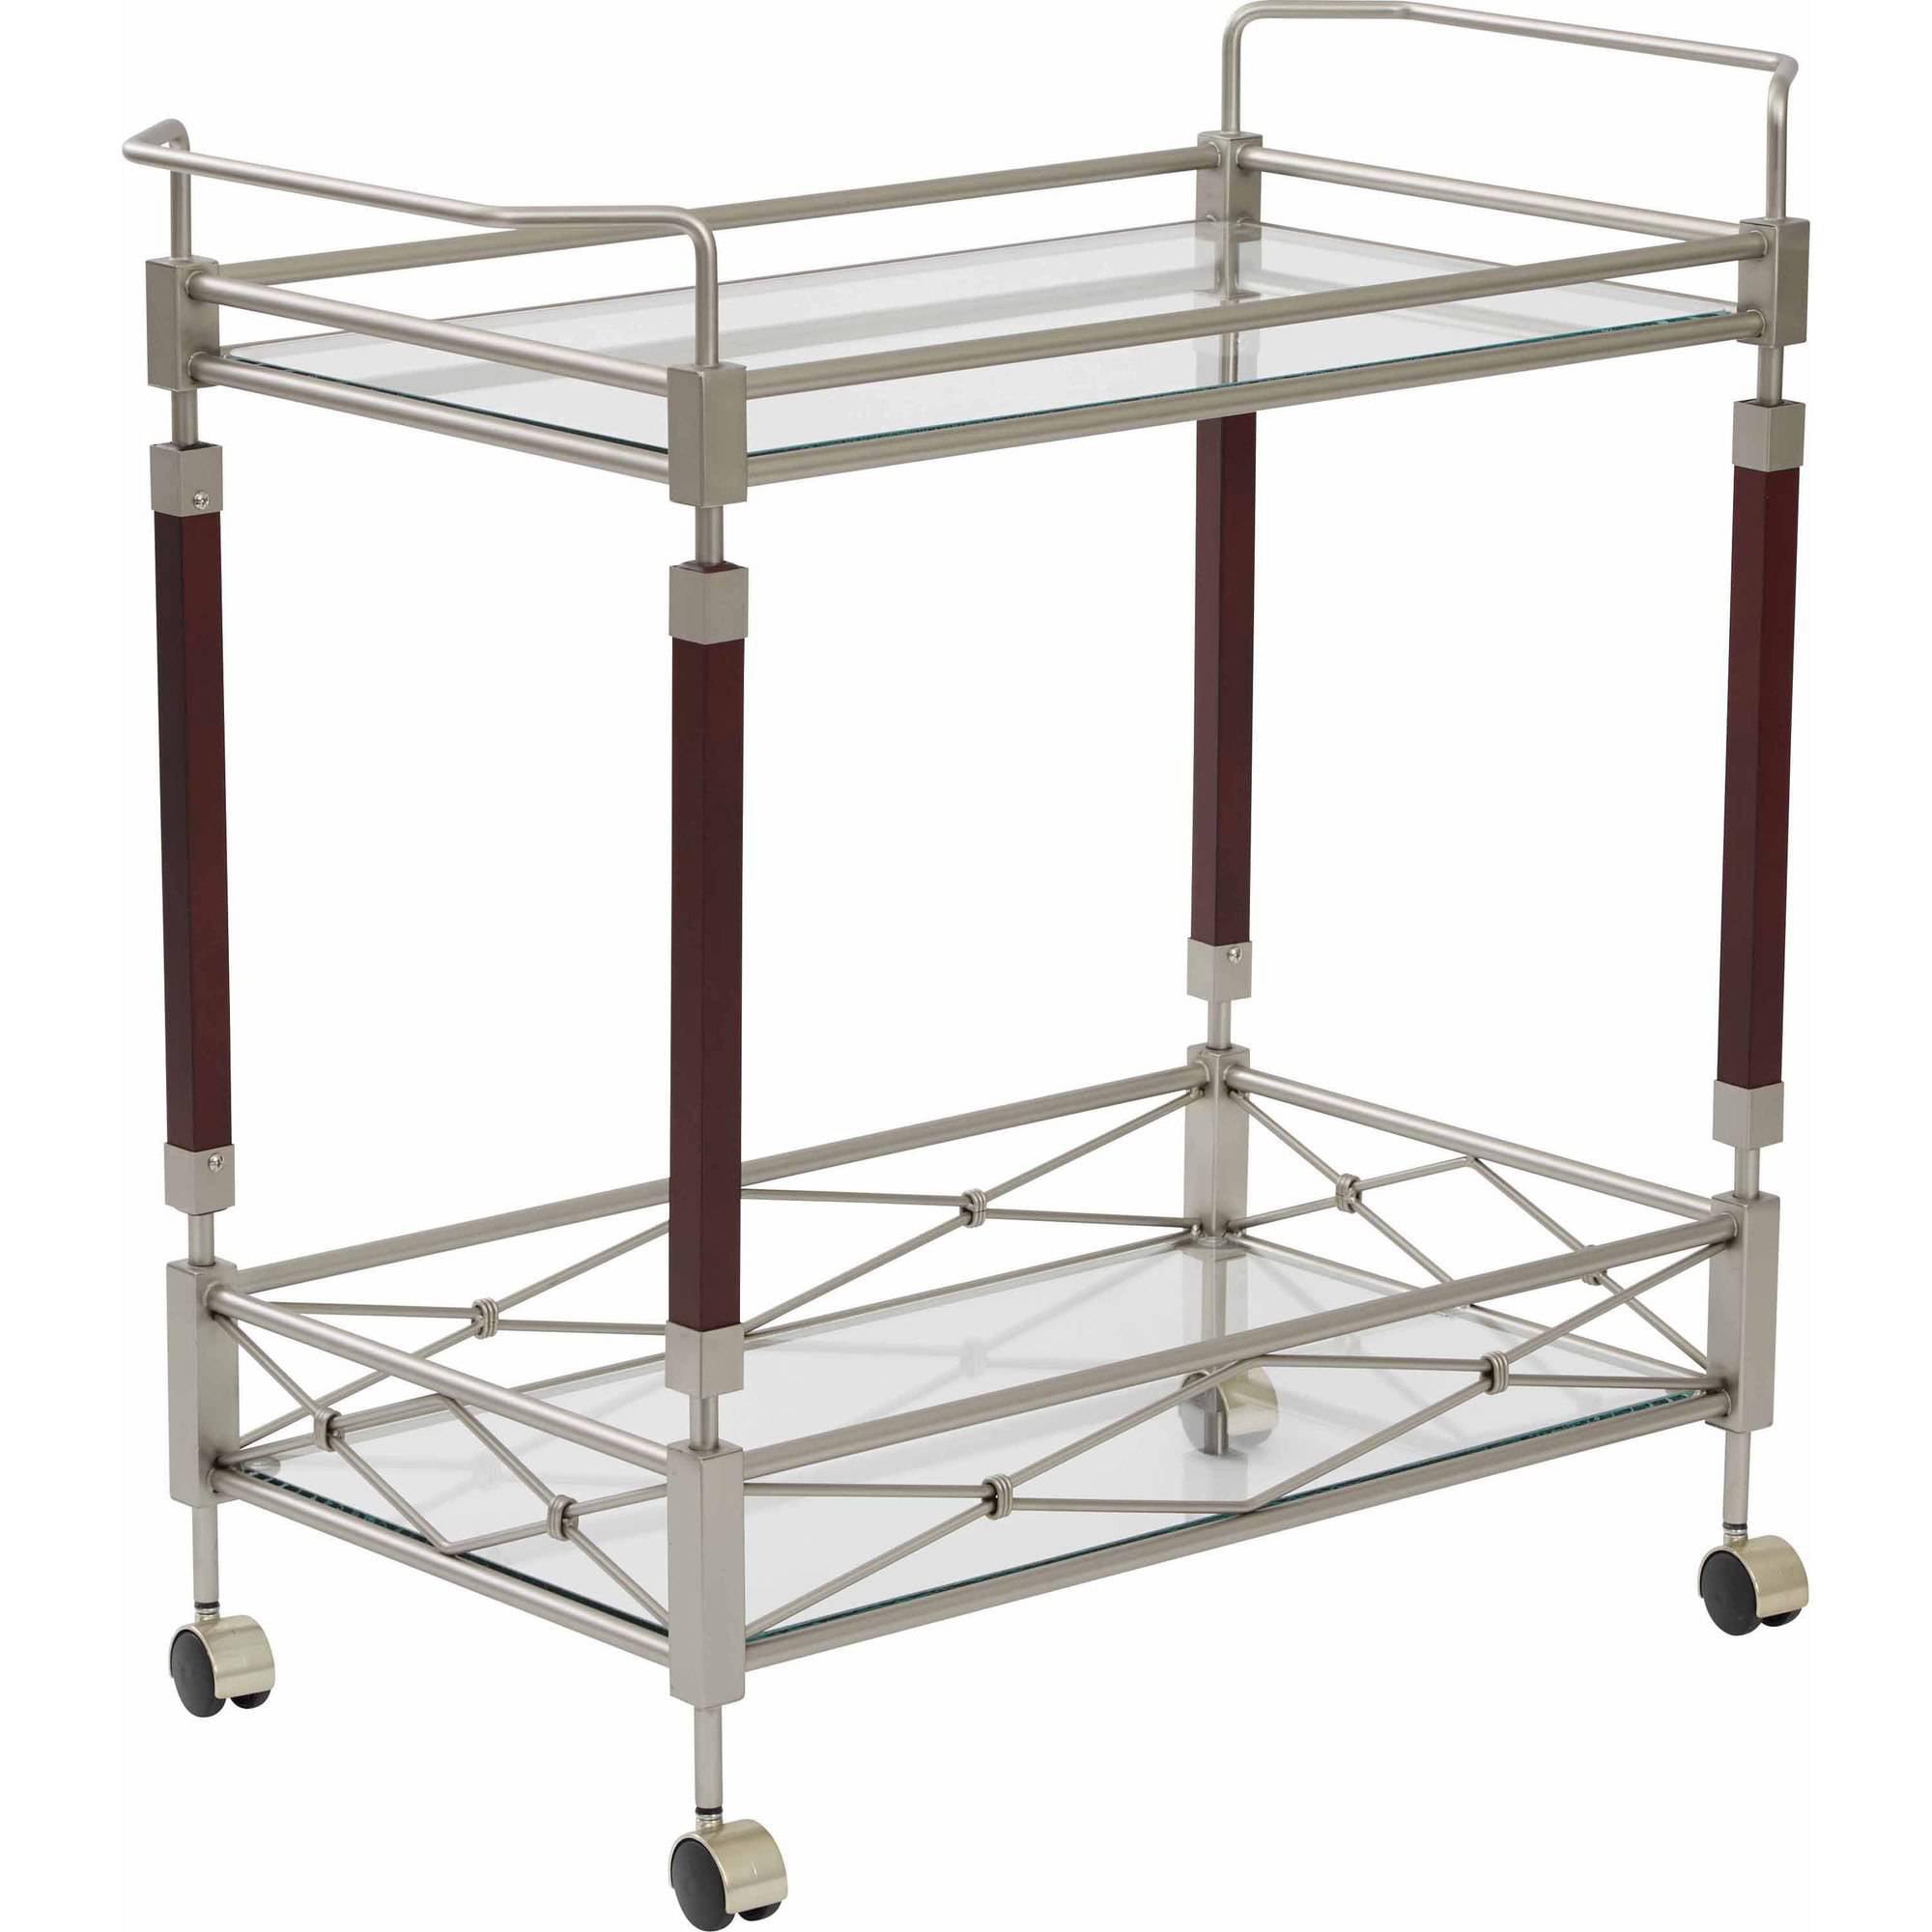 Kitchen cart metal - Office Star Melrose Serving Cart Nickel Brush Metal Frame Walmart Com